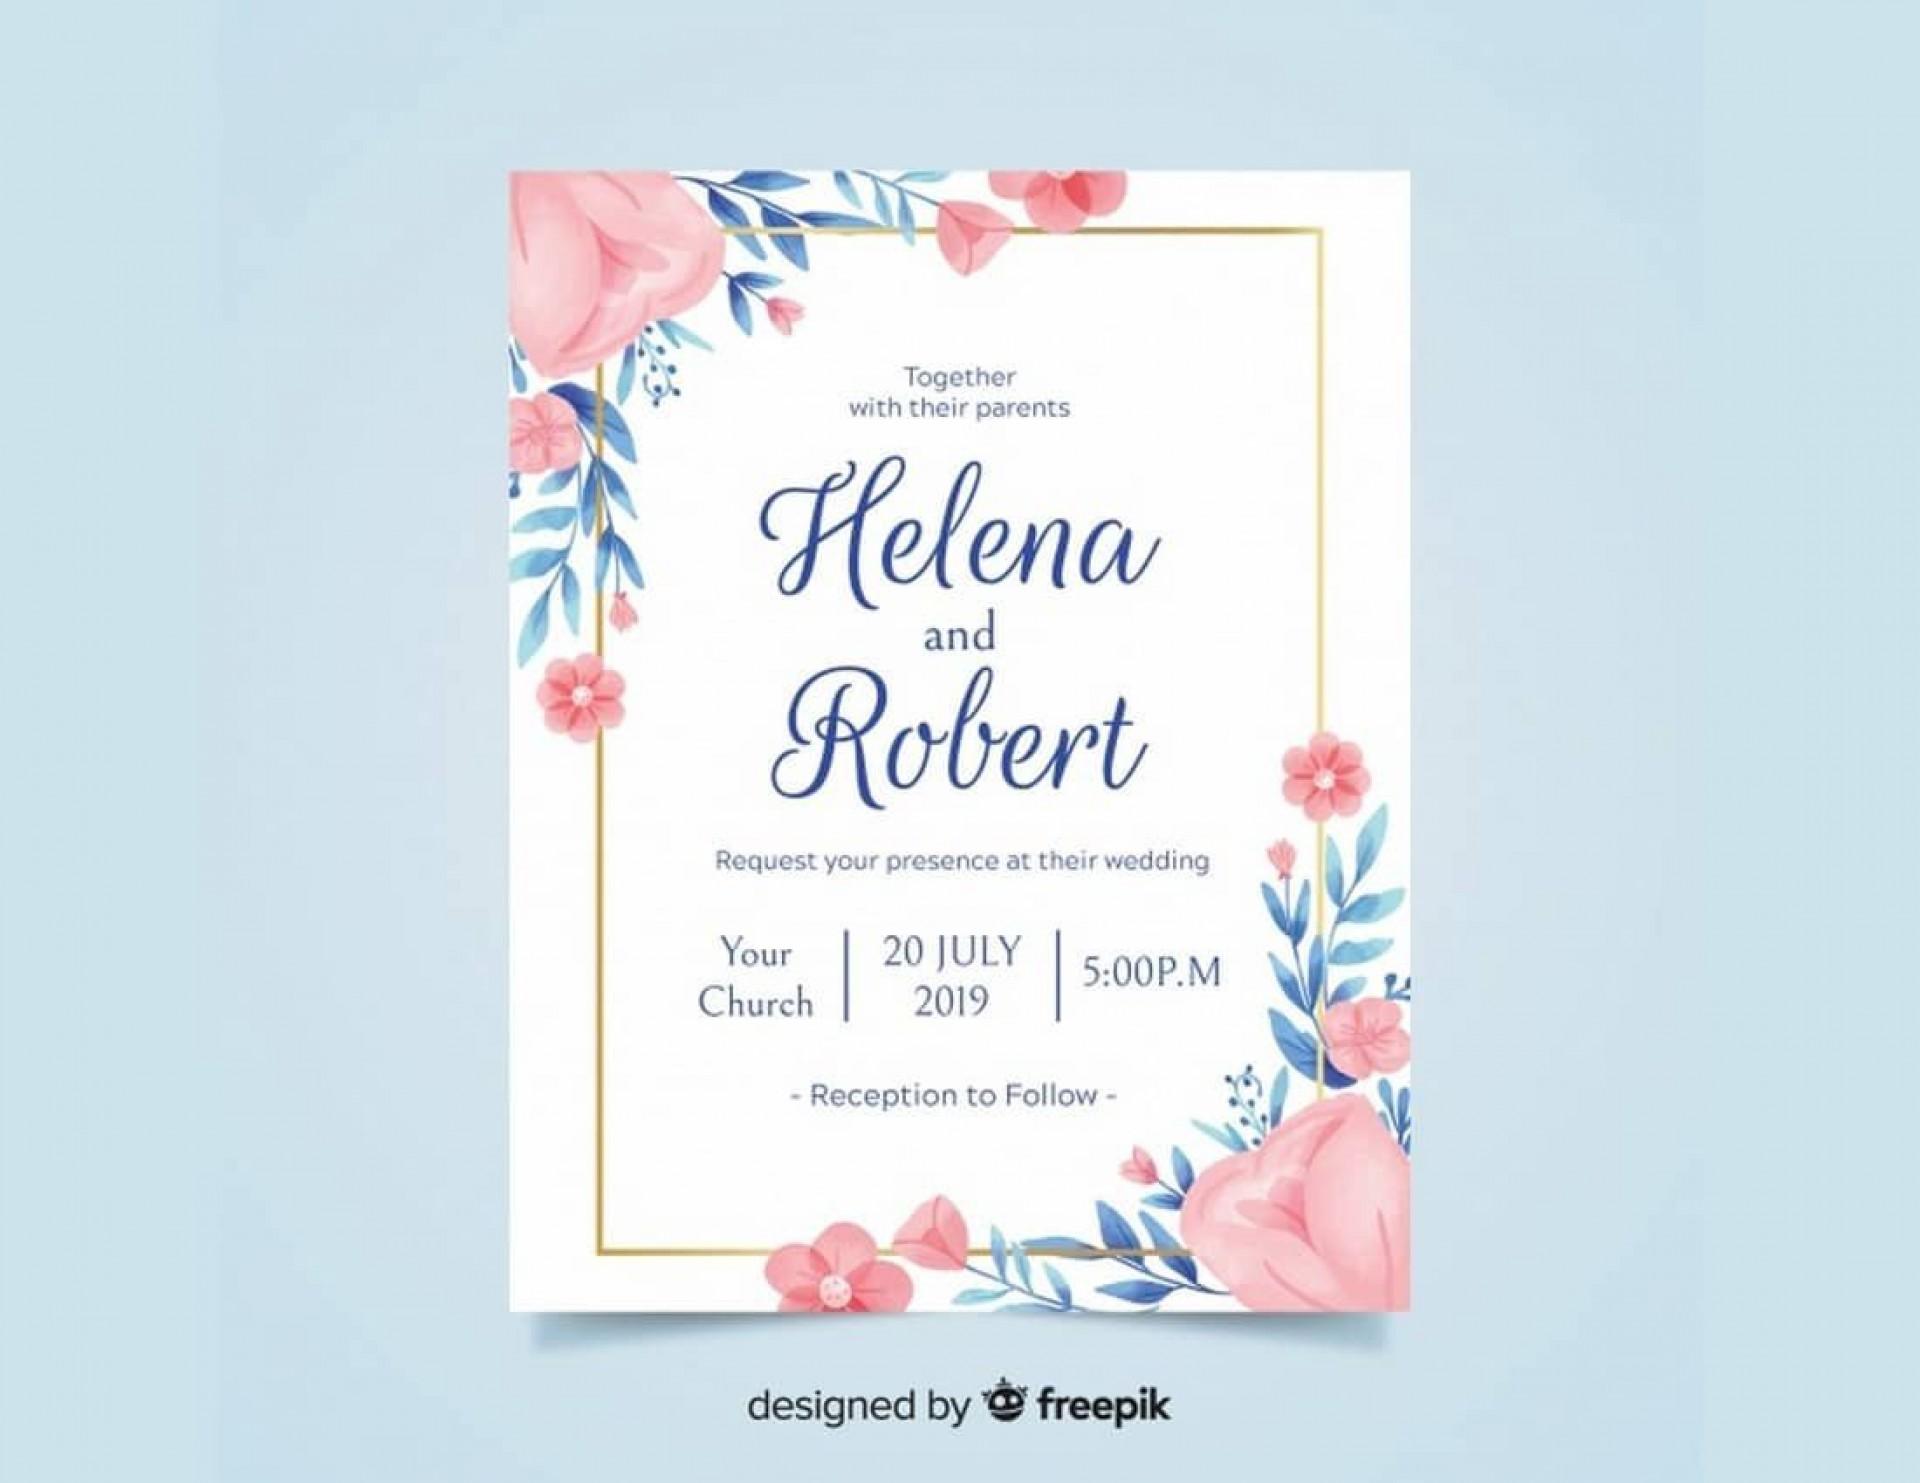 008 Stupendou Microsoft Office Wedding Invitation Template Photo  Templates M1920